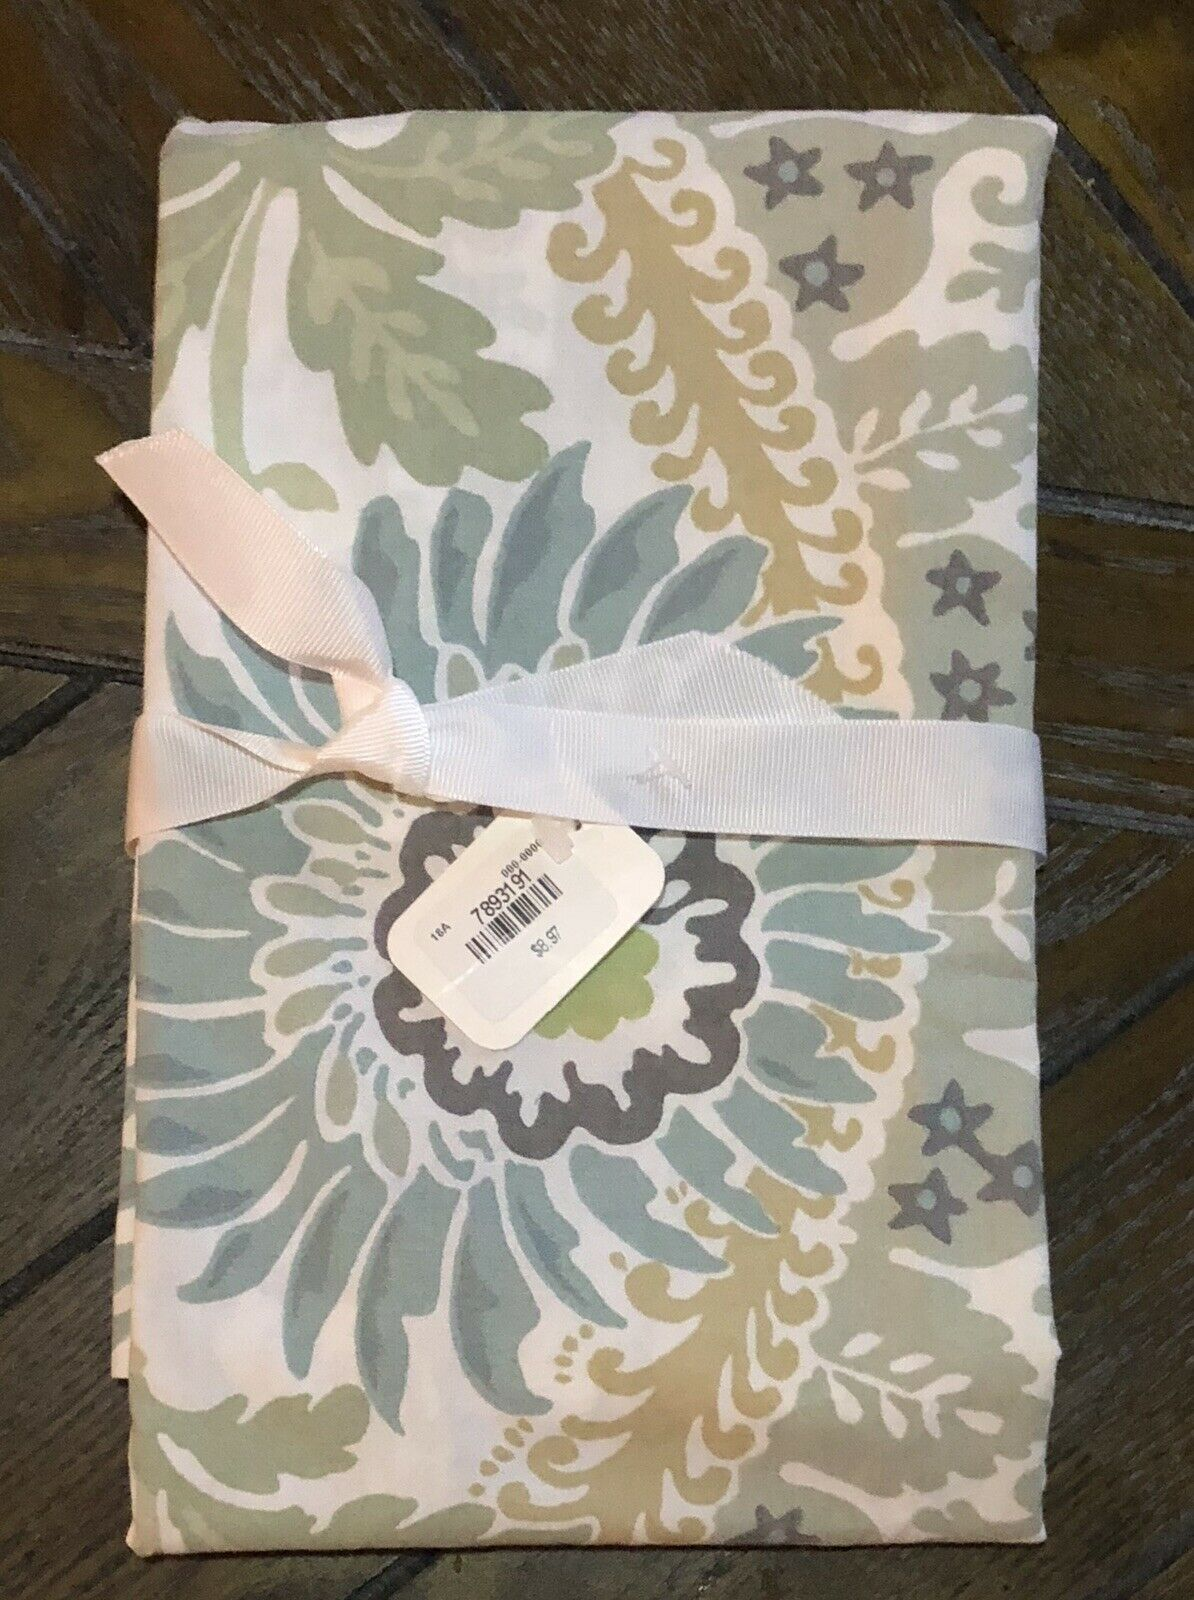 One New Pottery Barn Joni Euro Pillow Sham Cotton PB blueeee Green Floral Jacobean